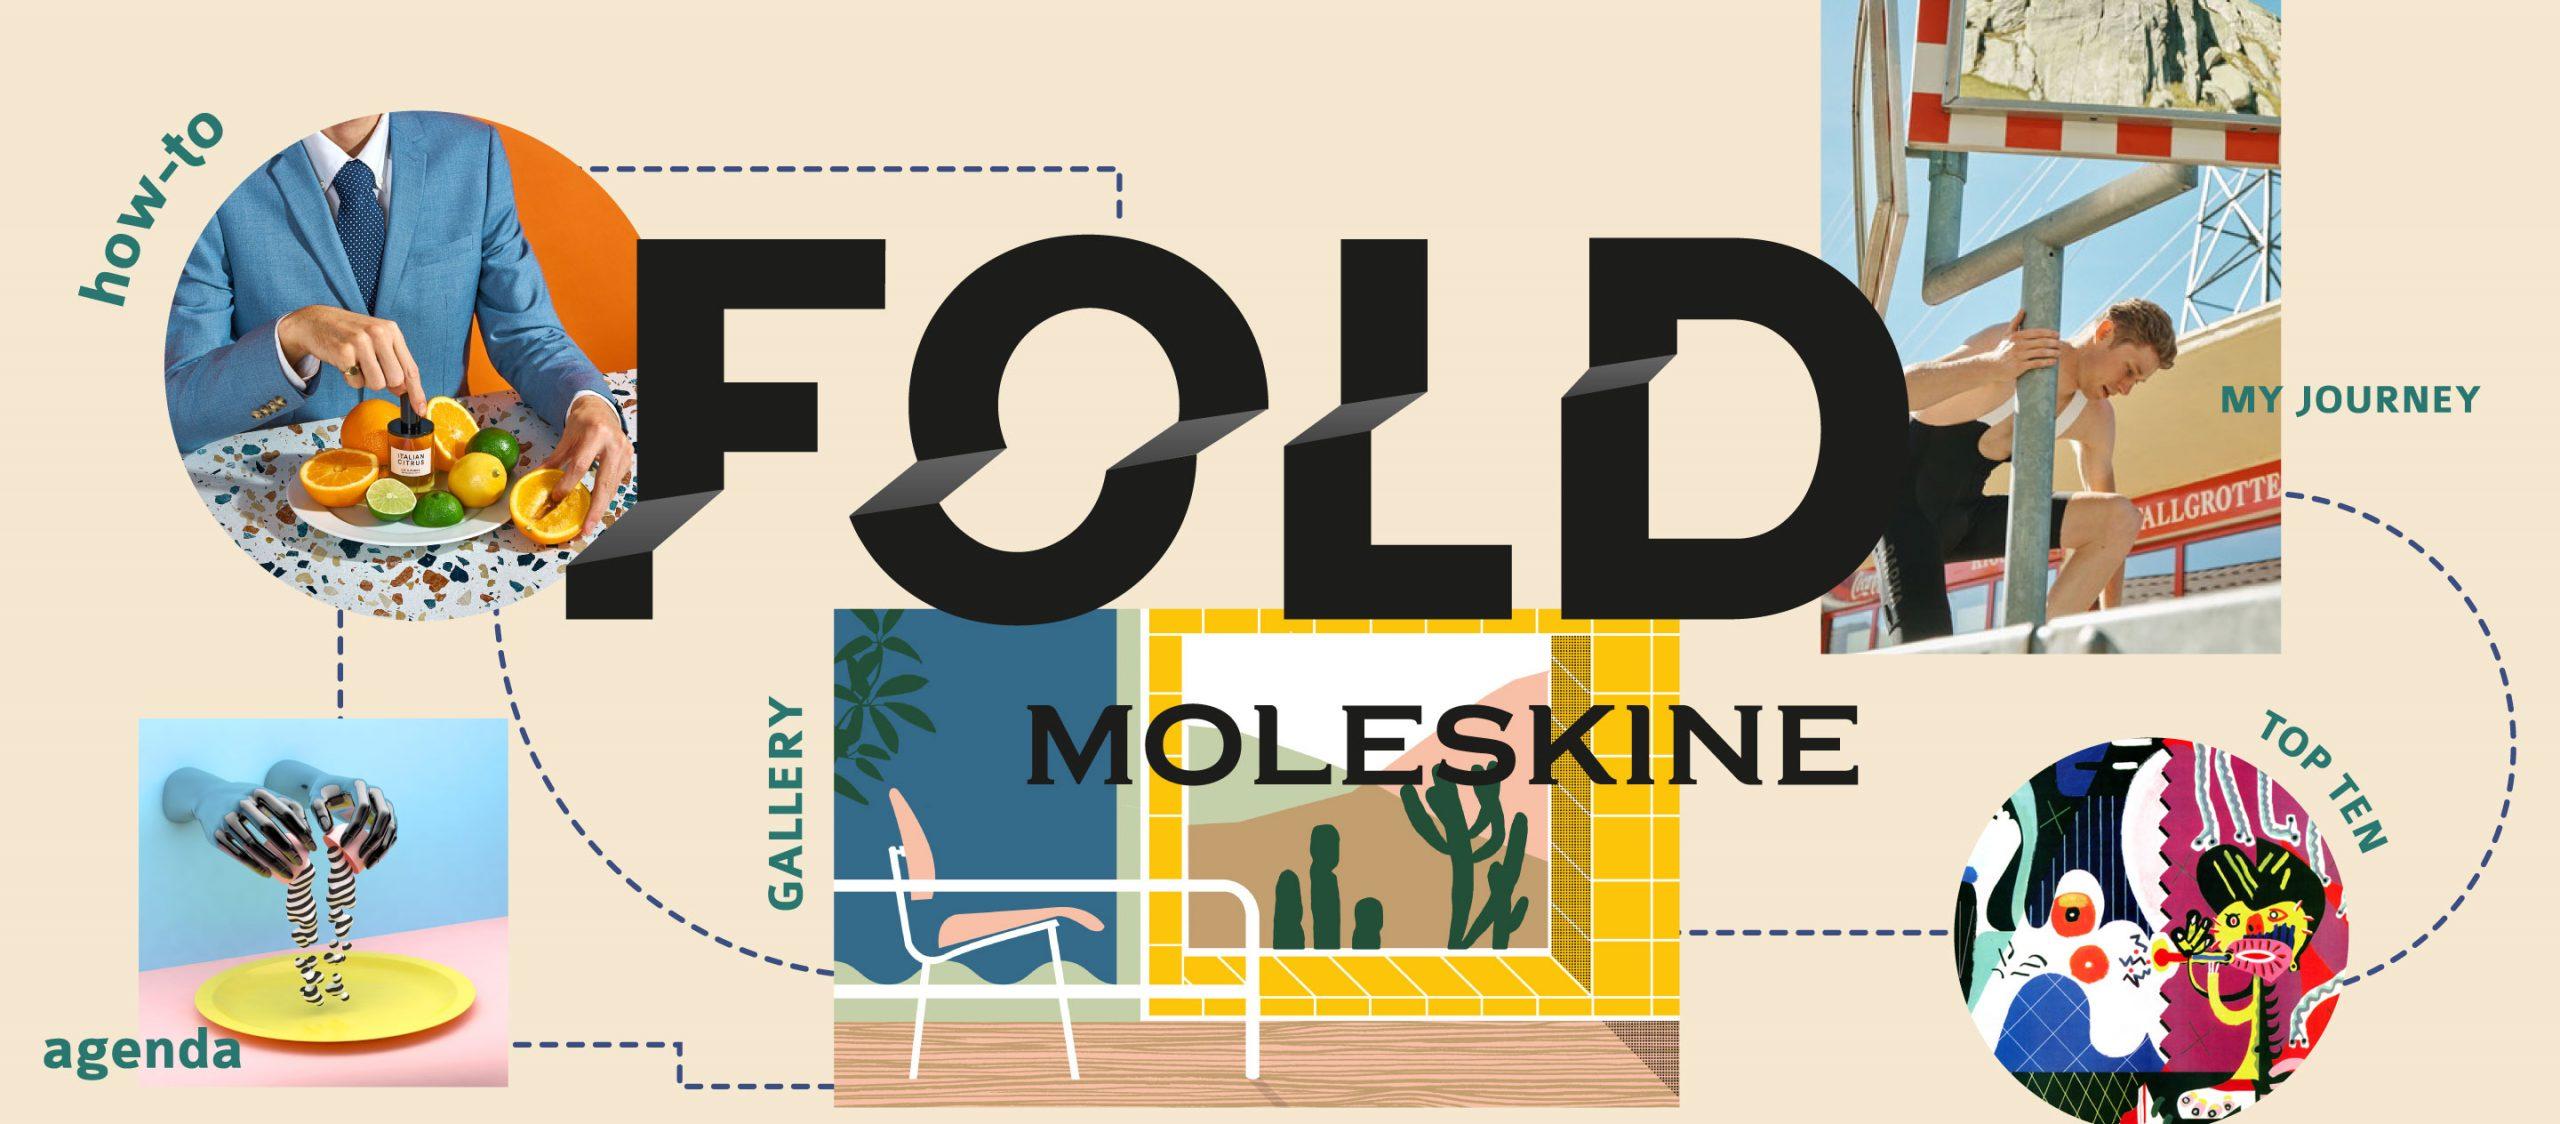 FOLD นิตยสารออนไลน์ของ Moleskine ที่รวบรวมแรงบันดาลใจจากนักสร้างสรรค์ทั่วโลก